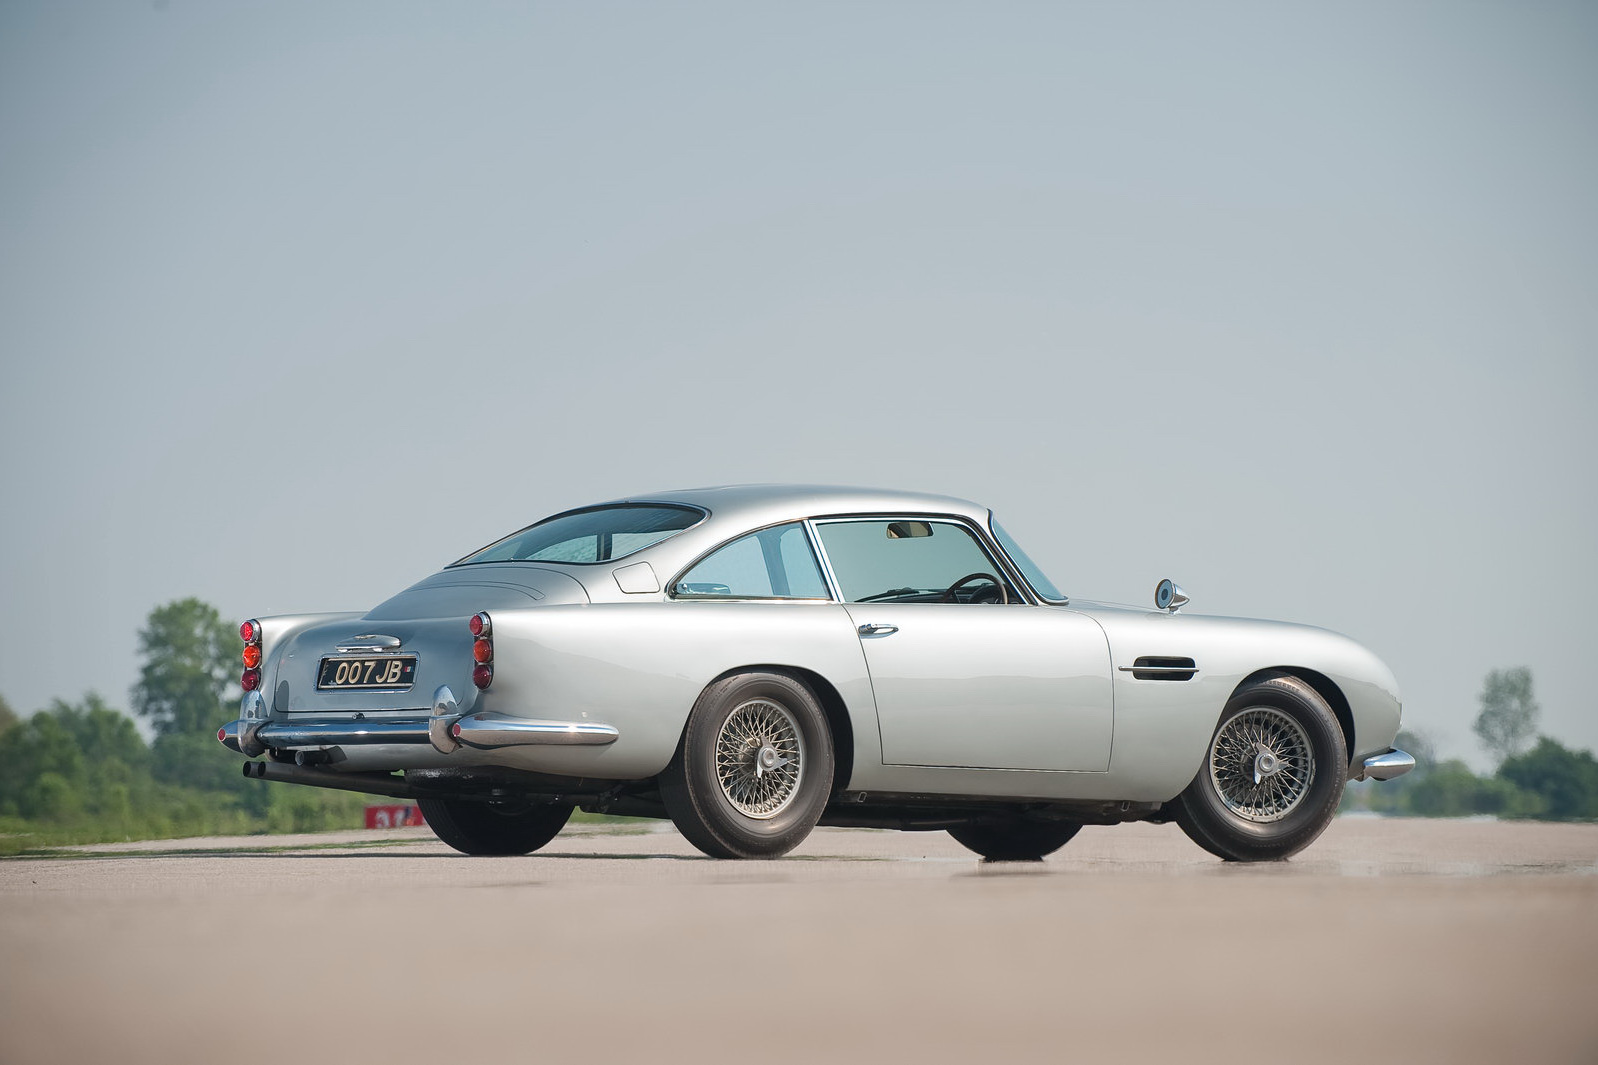 james bond 1964 aston martin db5 99 james bonds original 007 aston. Cars Review. Best American Auto & Cars Review